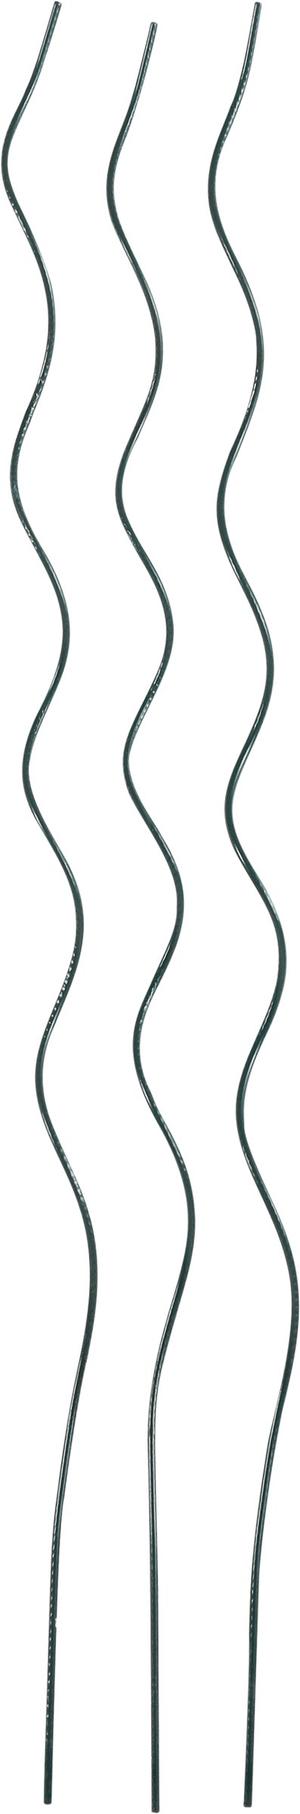 Spirale per pomodori